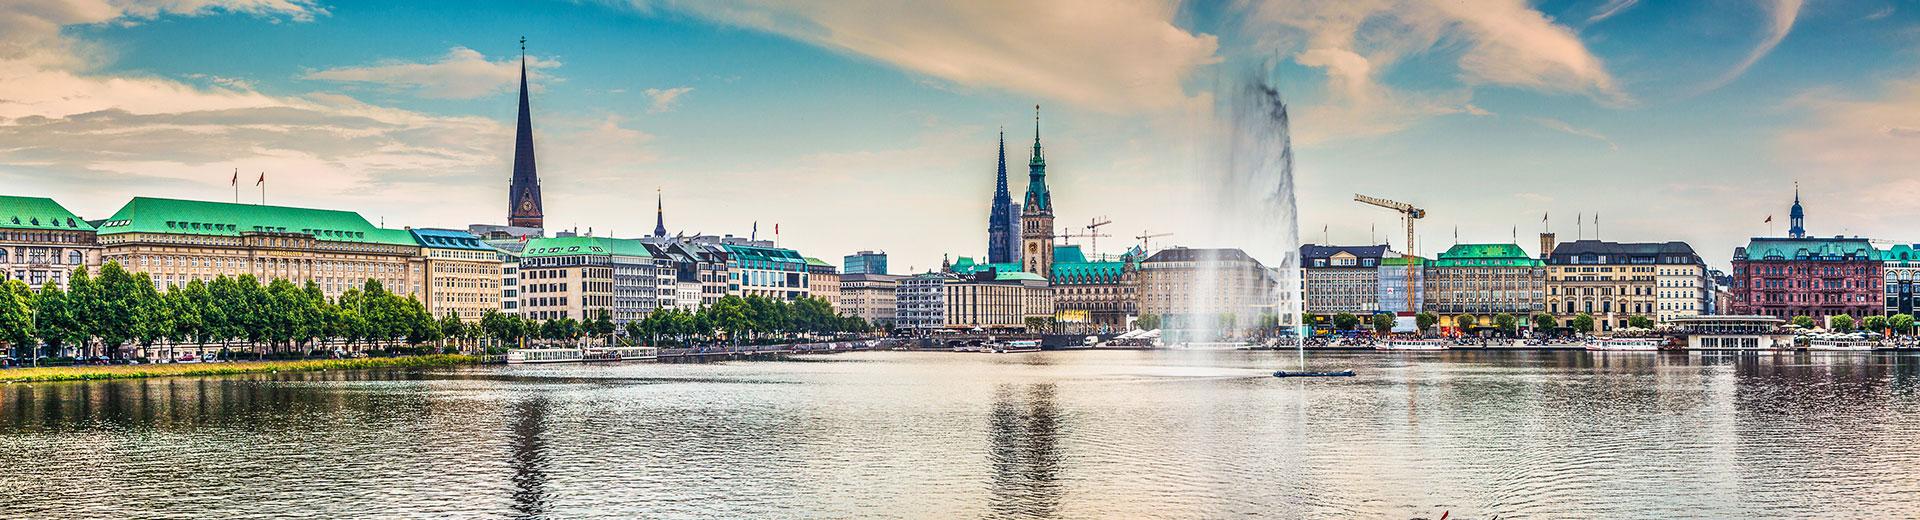 Gruppenreise Hamburg